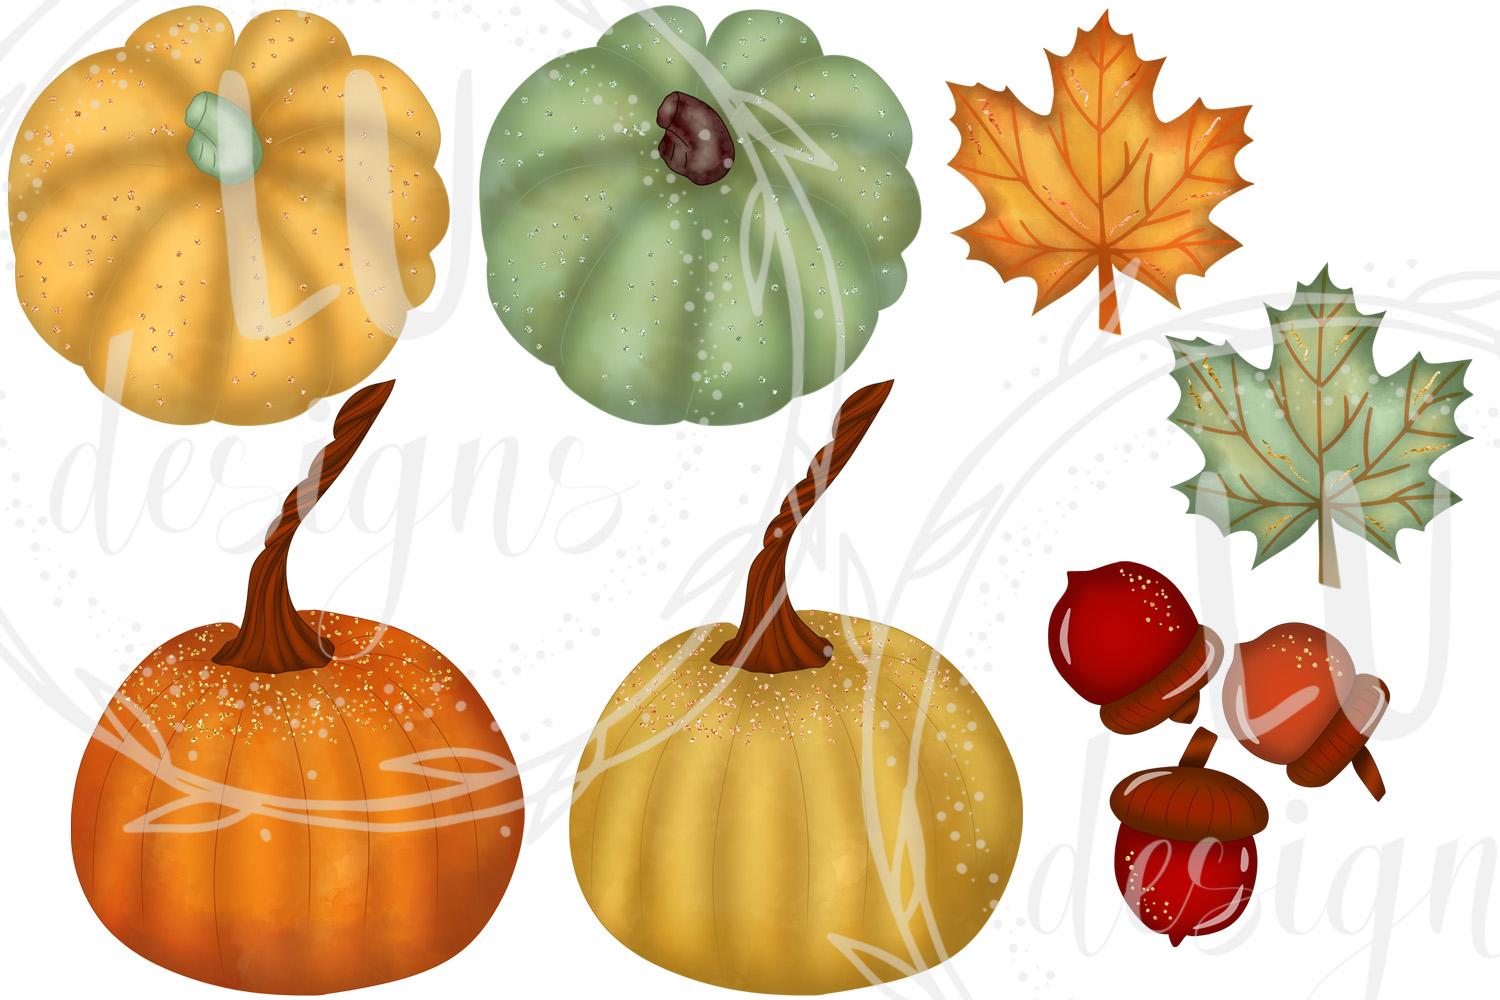 Fall Clipart, Autumn Graphics, Harvest Pumpkins Clipart example image 4